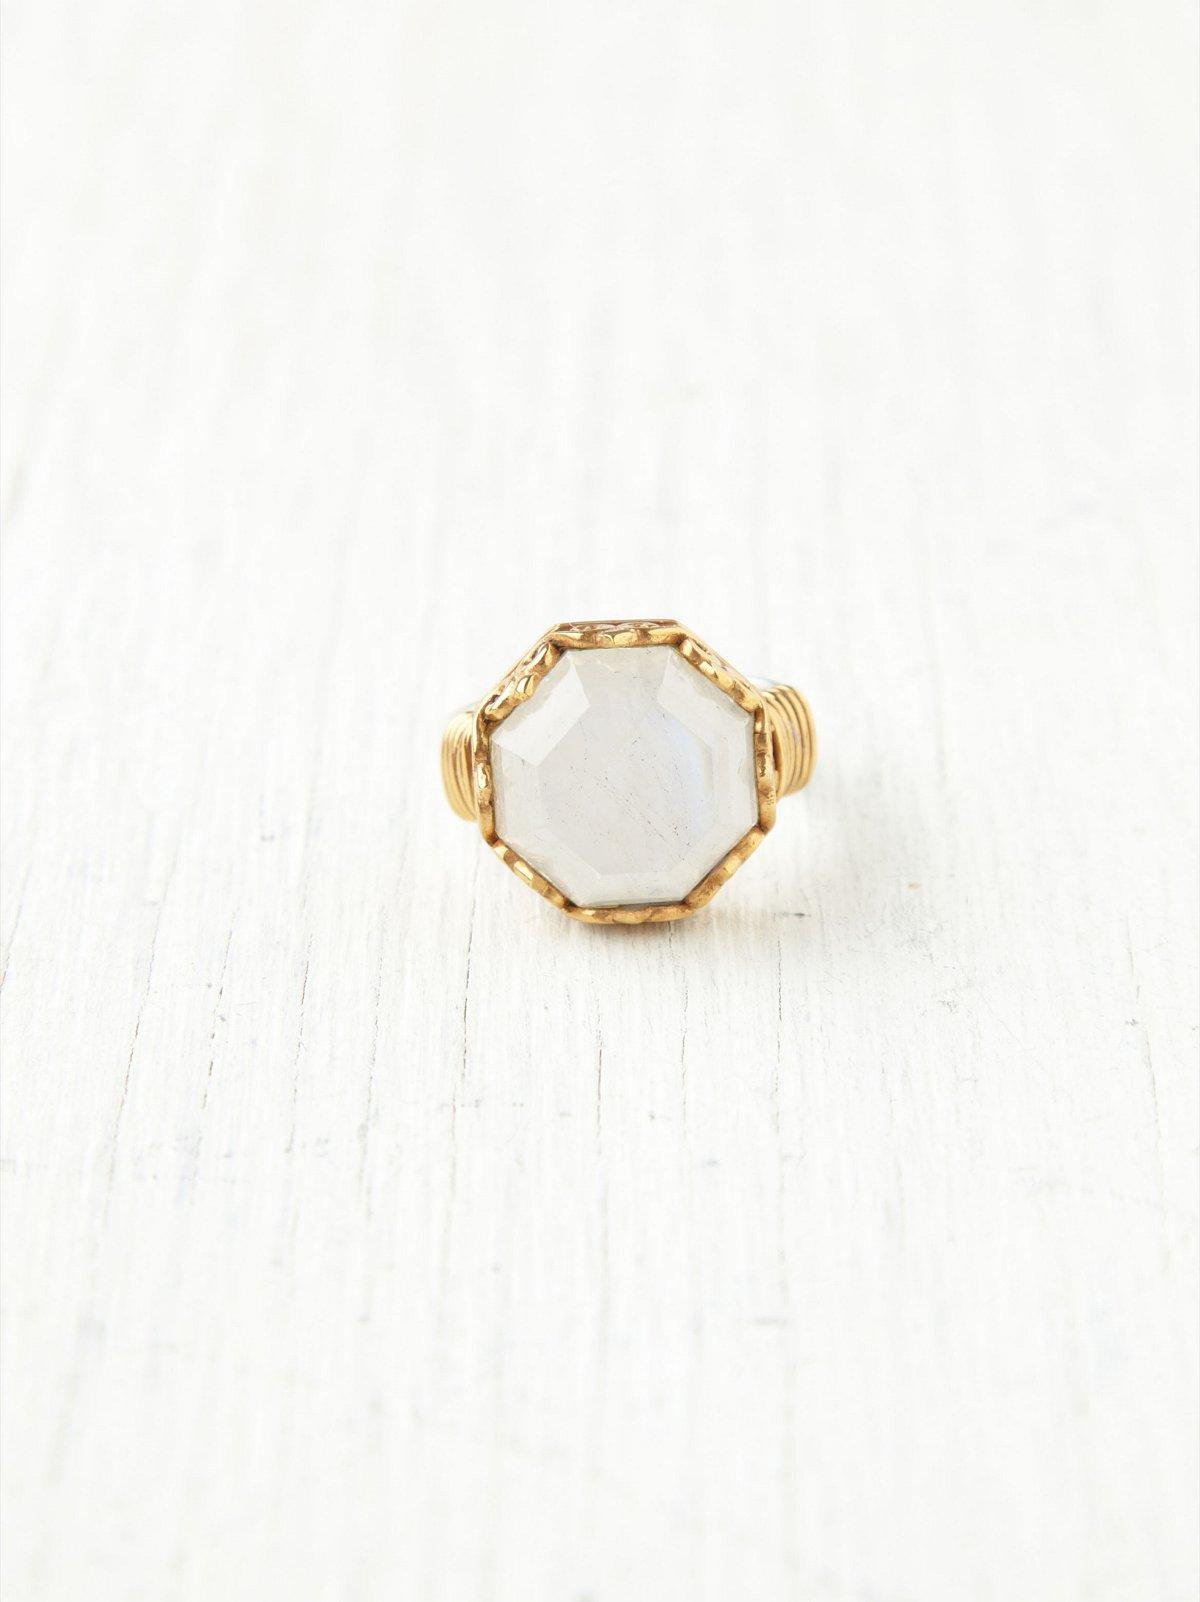 Octagonal Monarch Ring